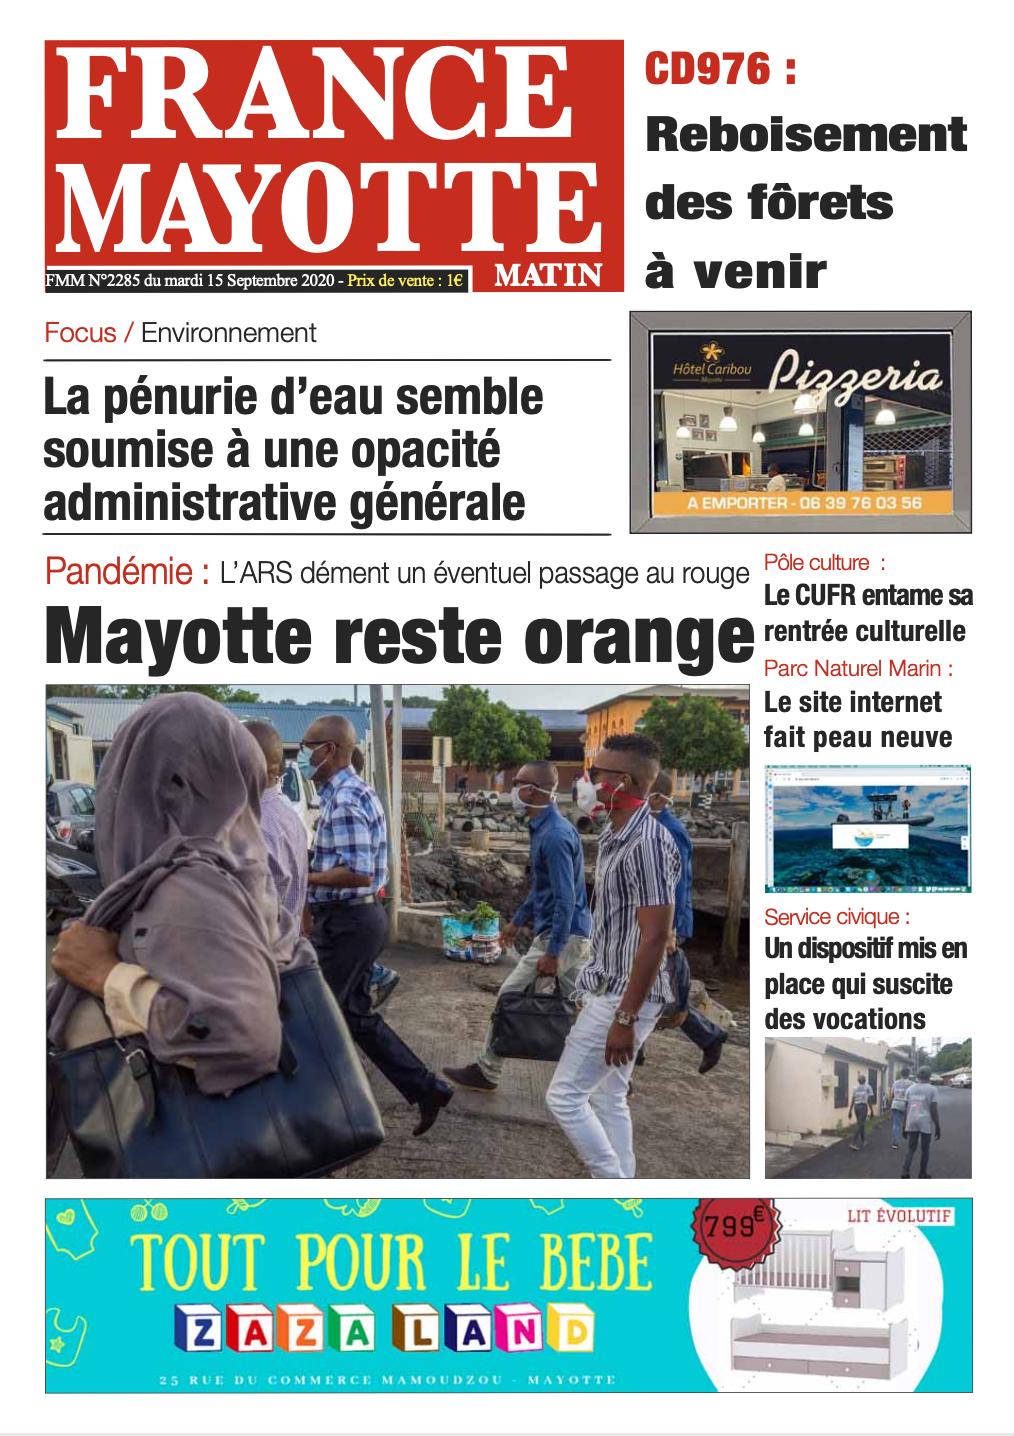 France Mayotte Mardi 15 septembre 2020